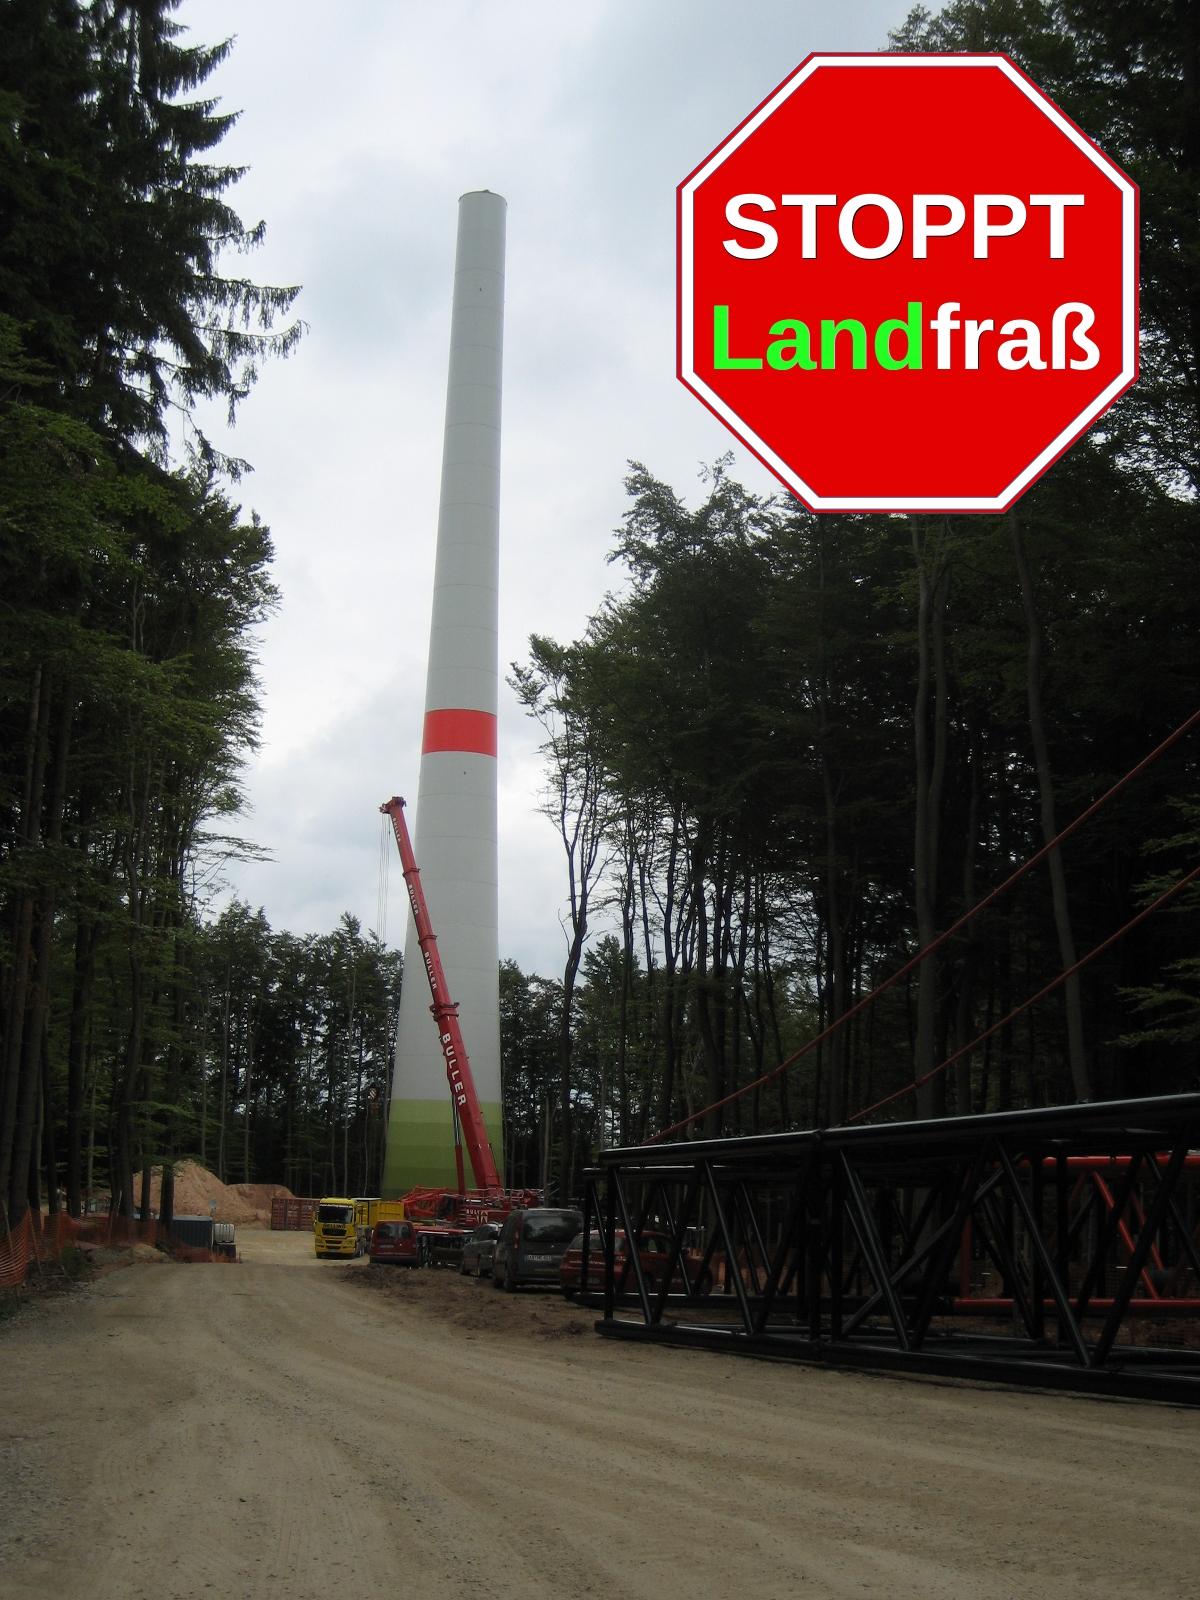 stoppt-landfrass-errichtung-wka-turm-1200